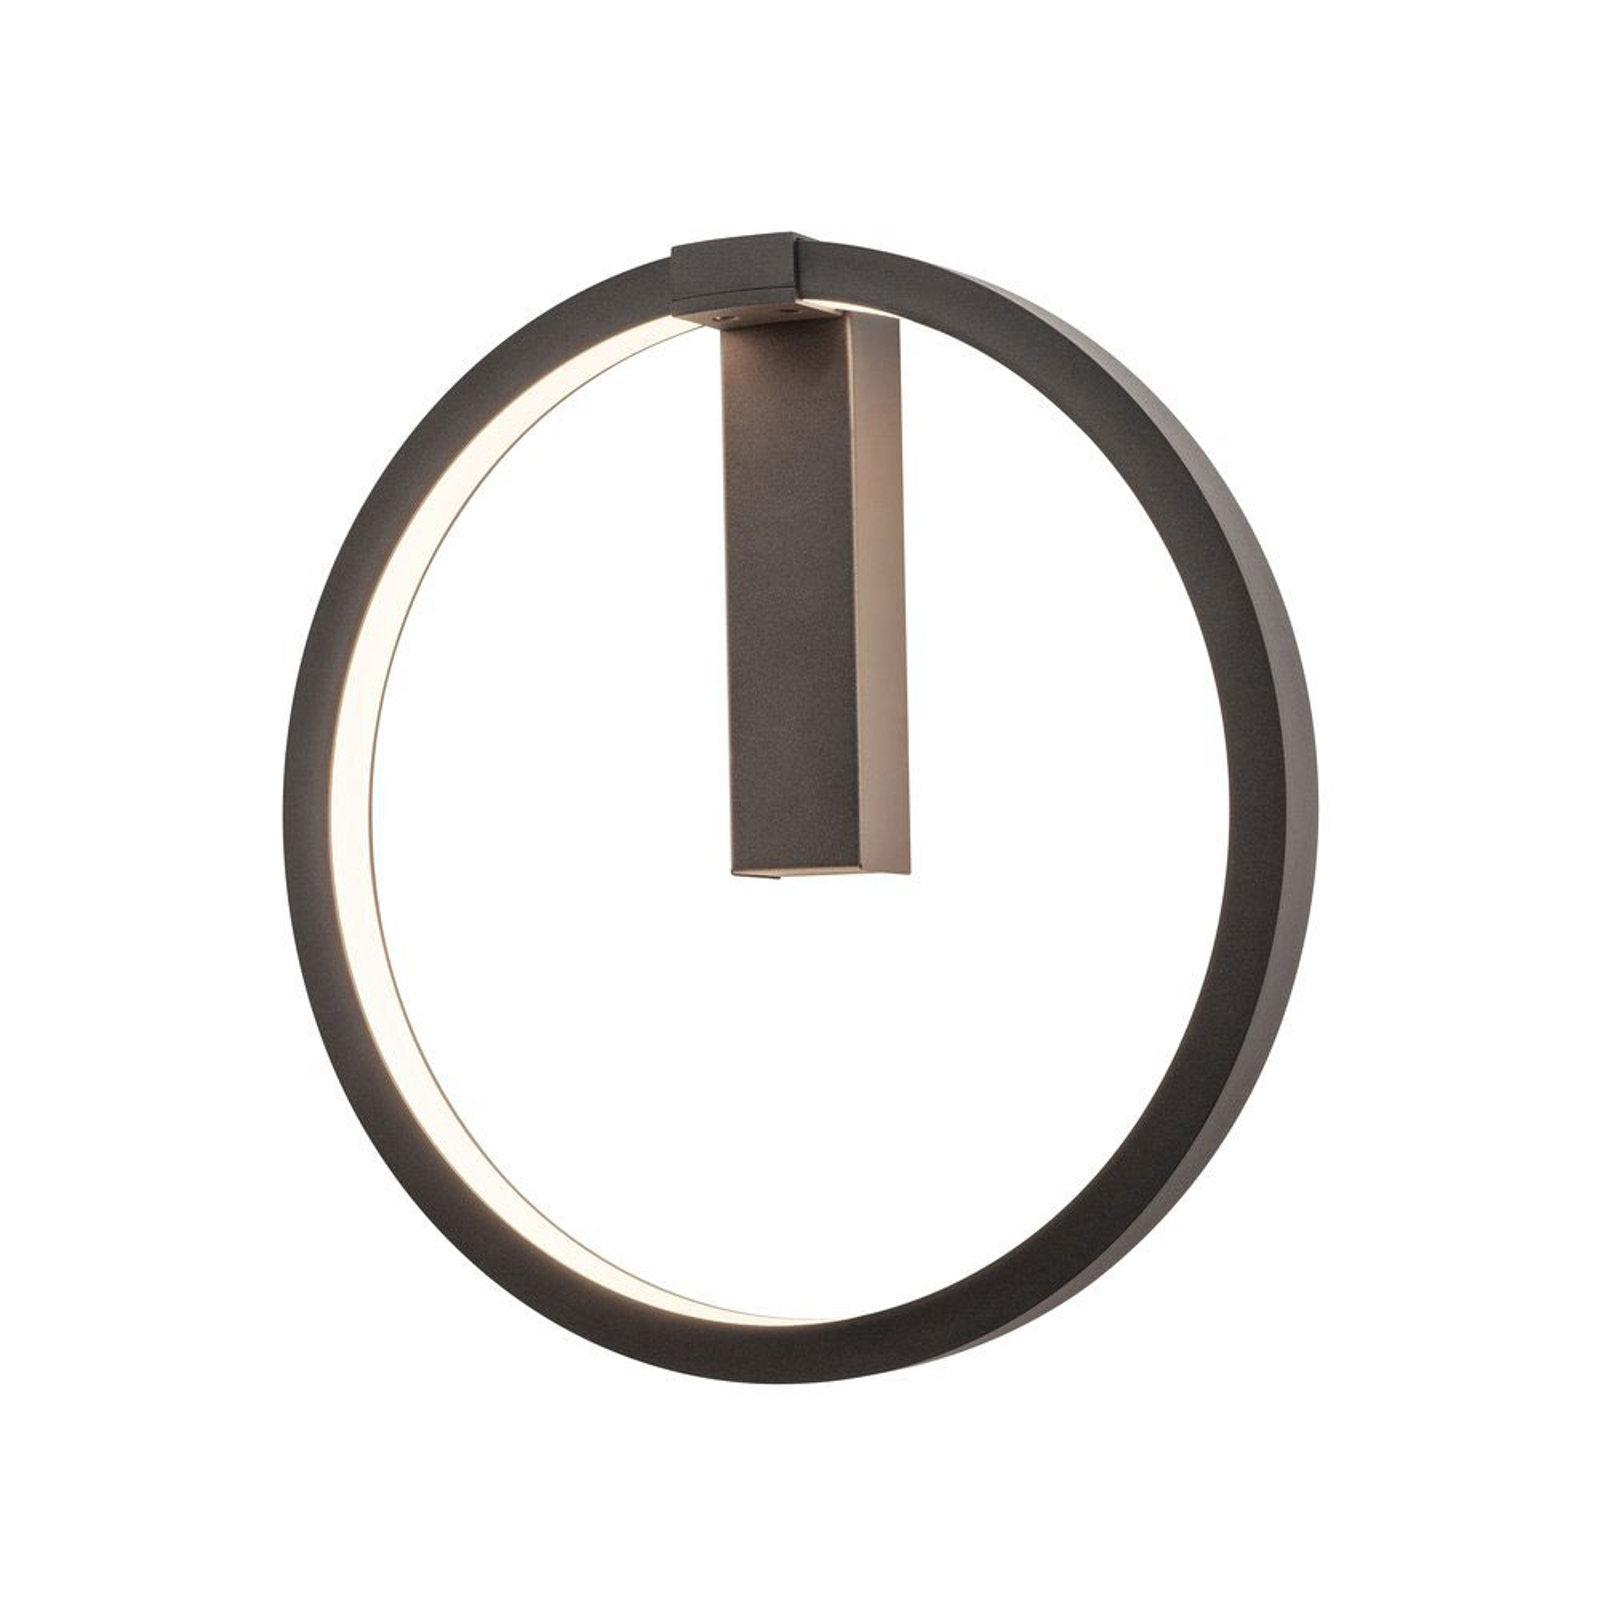 SLV One LED wall light, DALI, ring-shaped_5511220_1